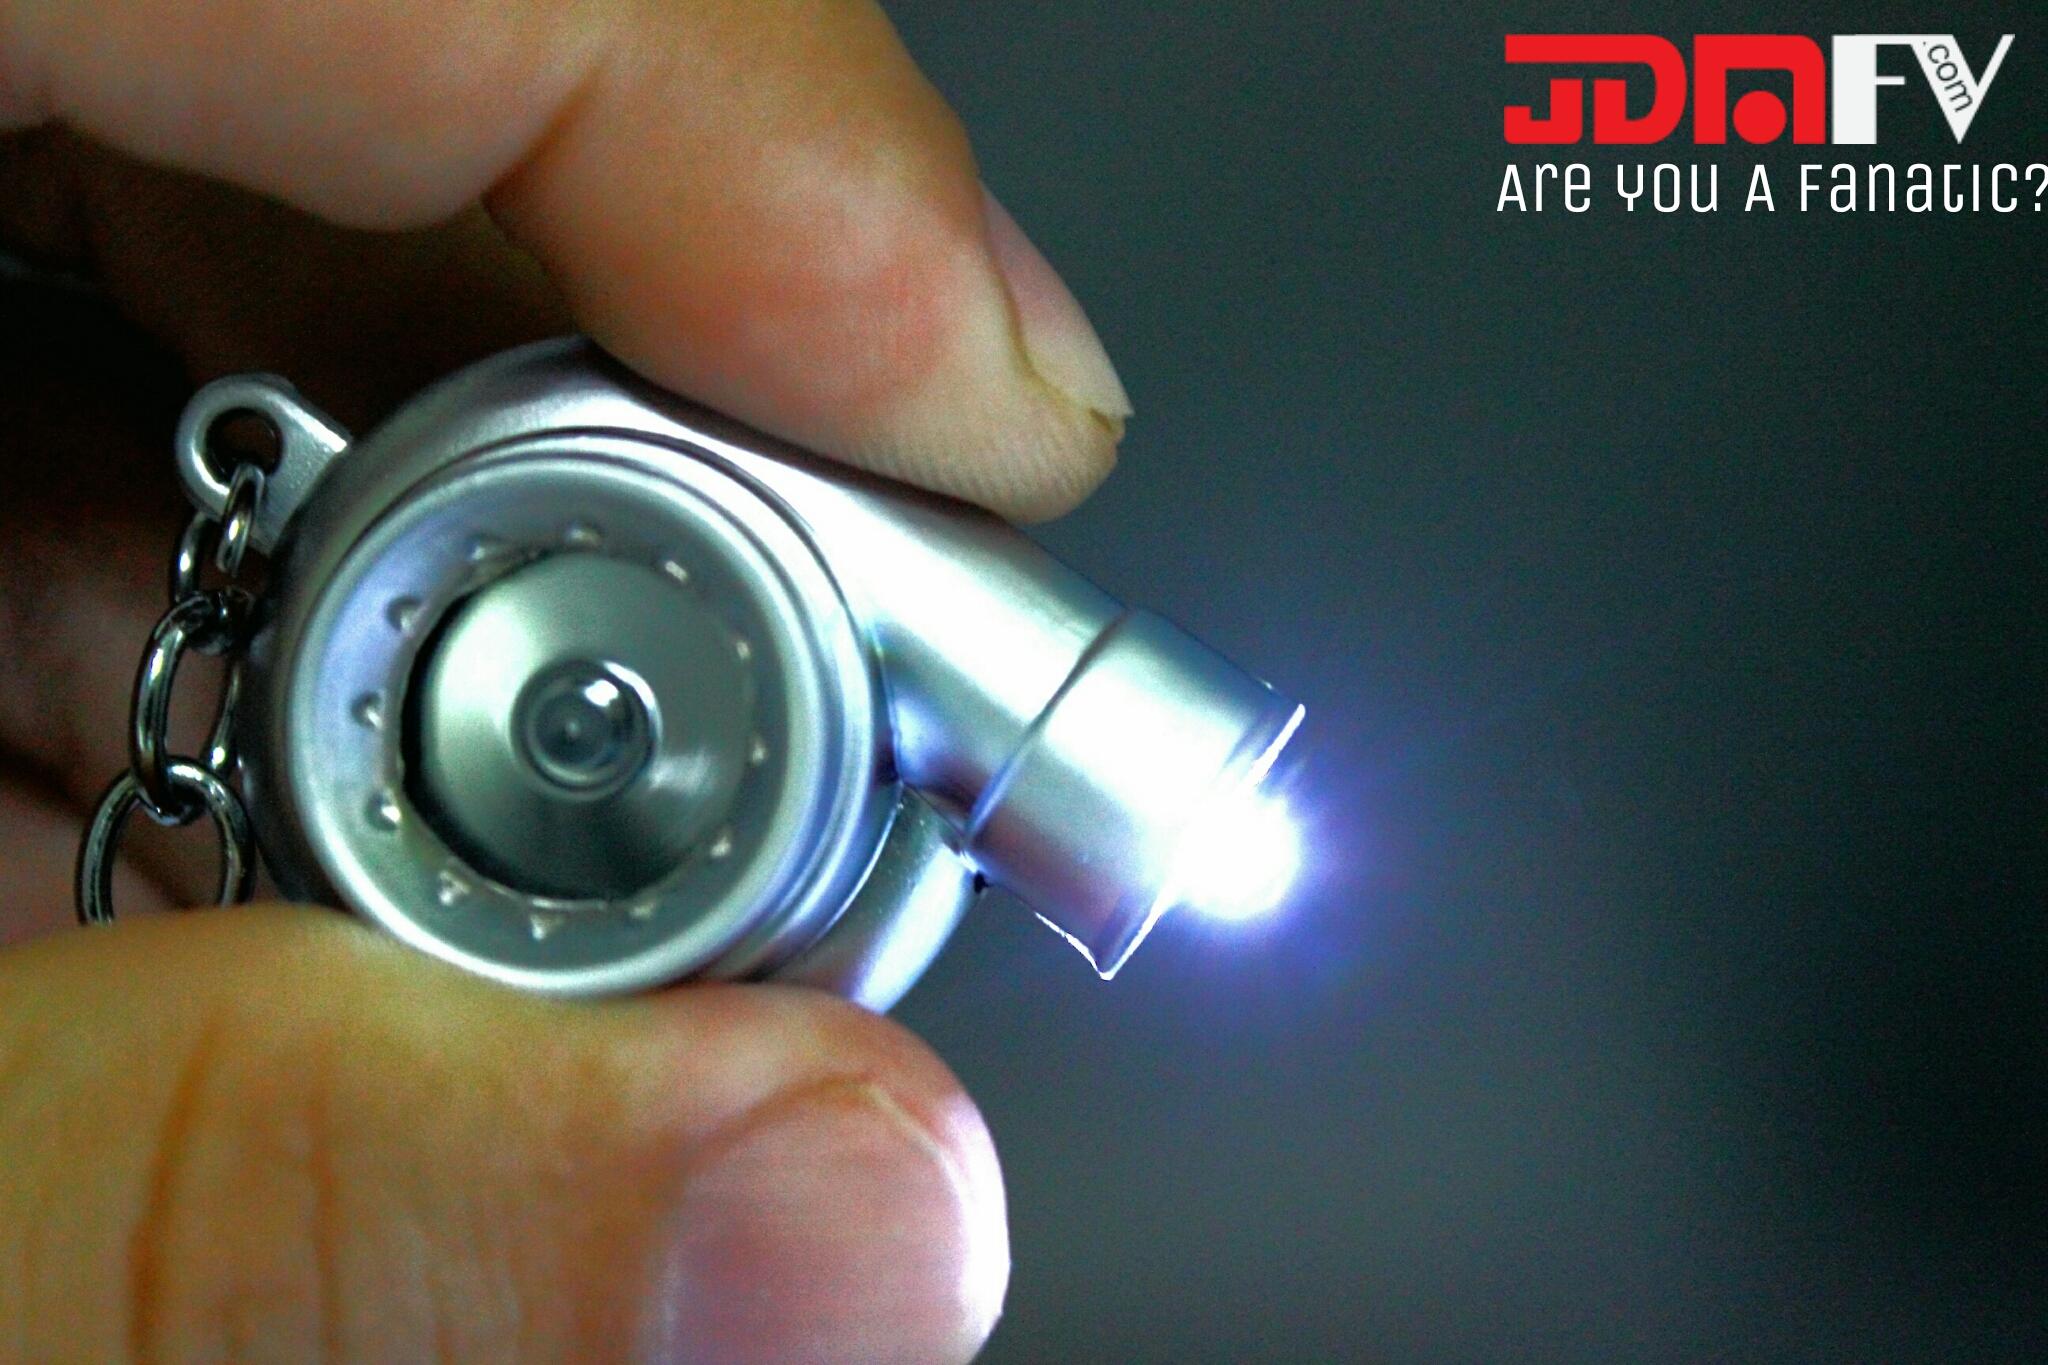 turbo-with-spinning-turbine-and-light-1-jdmfv.jpg